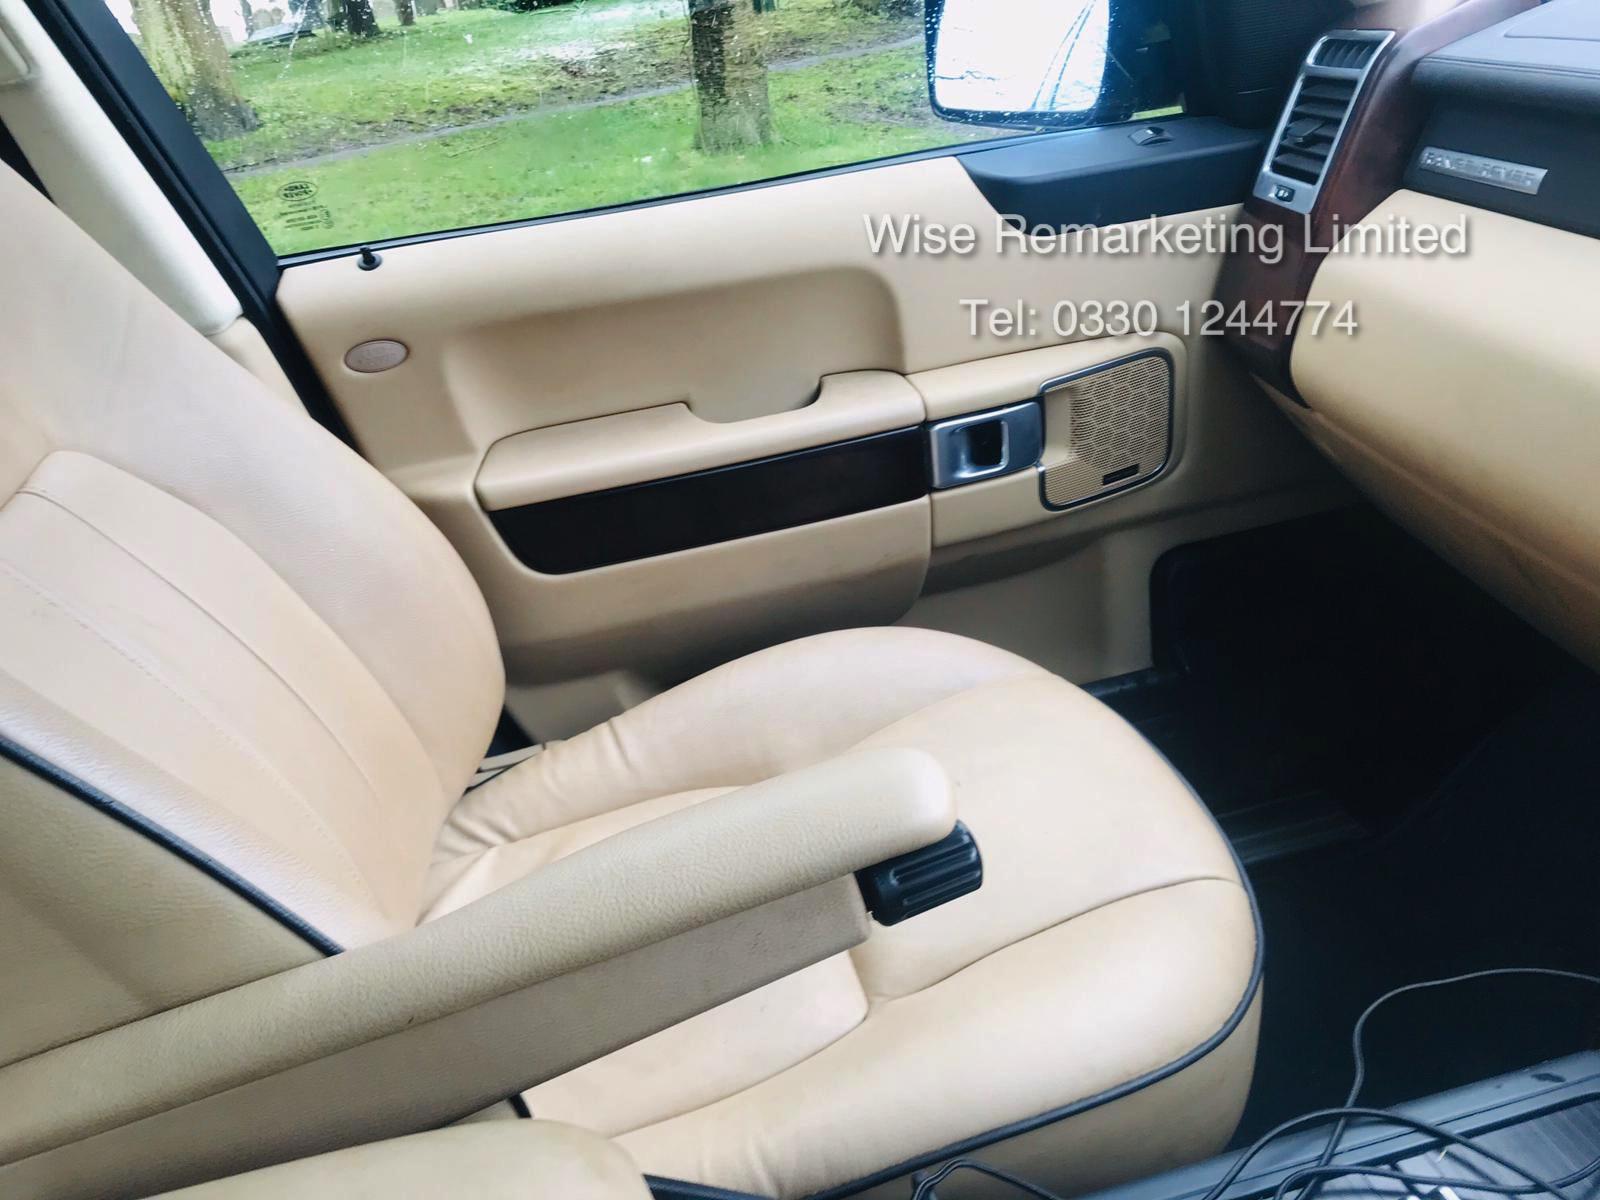 Range Rover Vogue 3.6 TDV8 HSE Auto - 2010 Model - Cream Leather - Service History - - Image 19 of 28